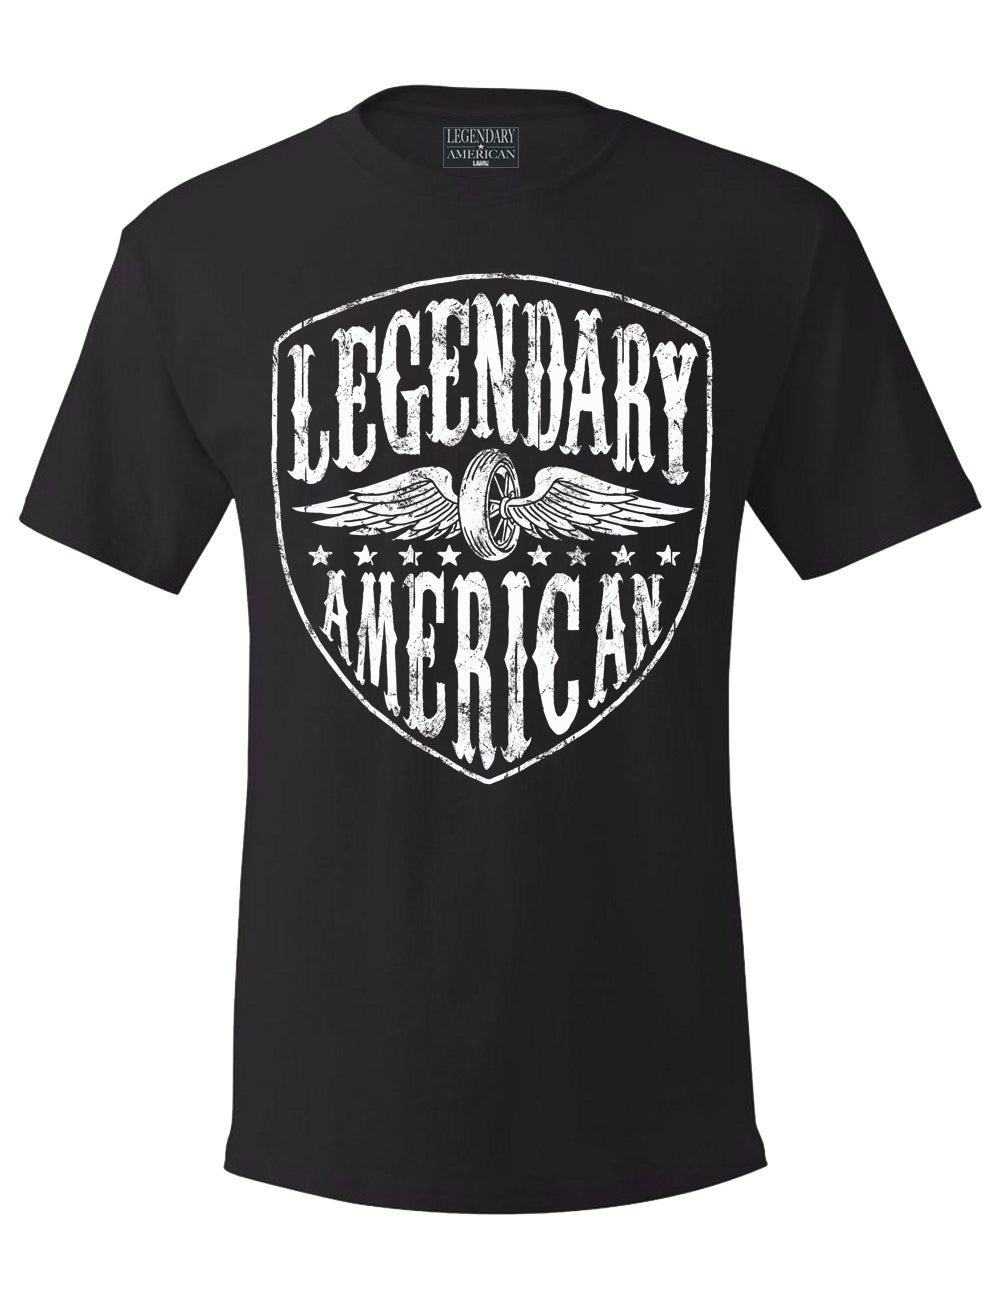 Image of Legendary American Moto Tee